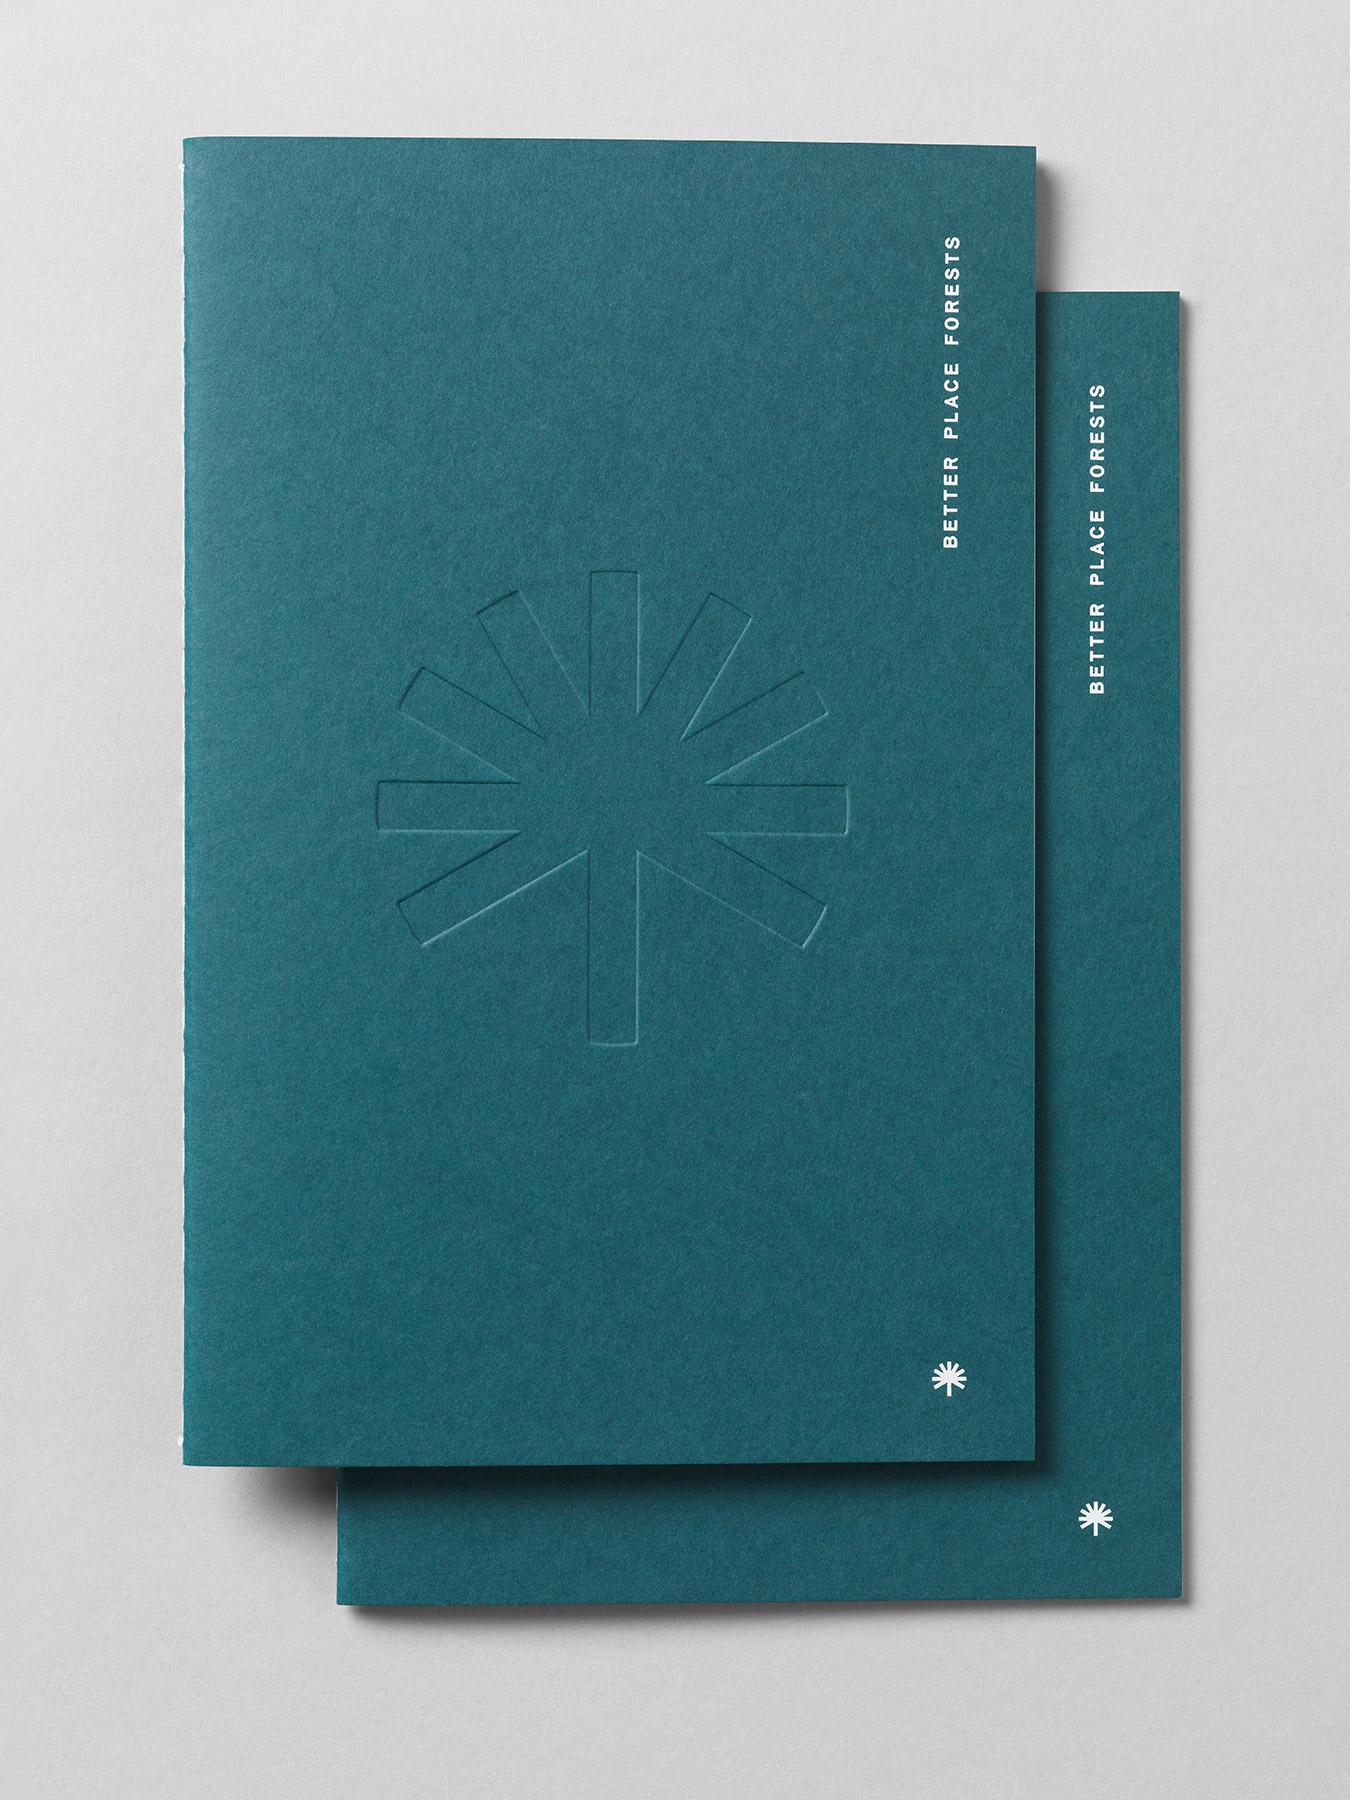 bpf_brochure-cover_1350x1800